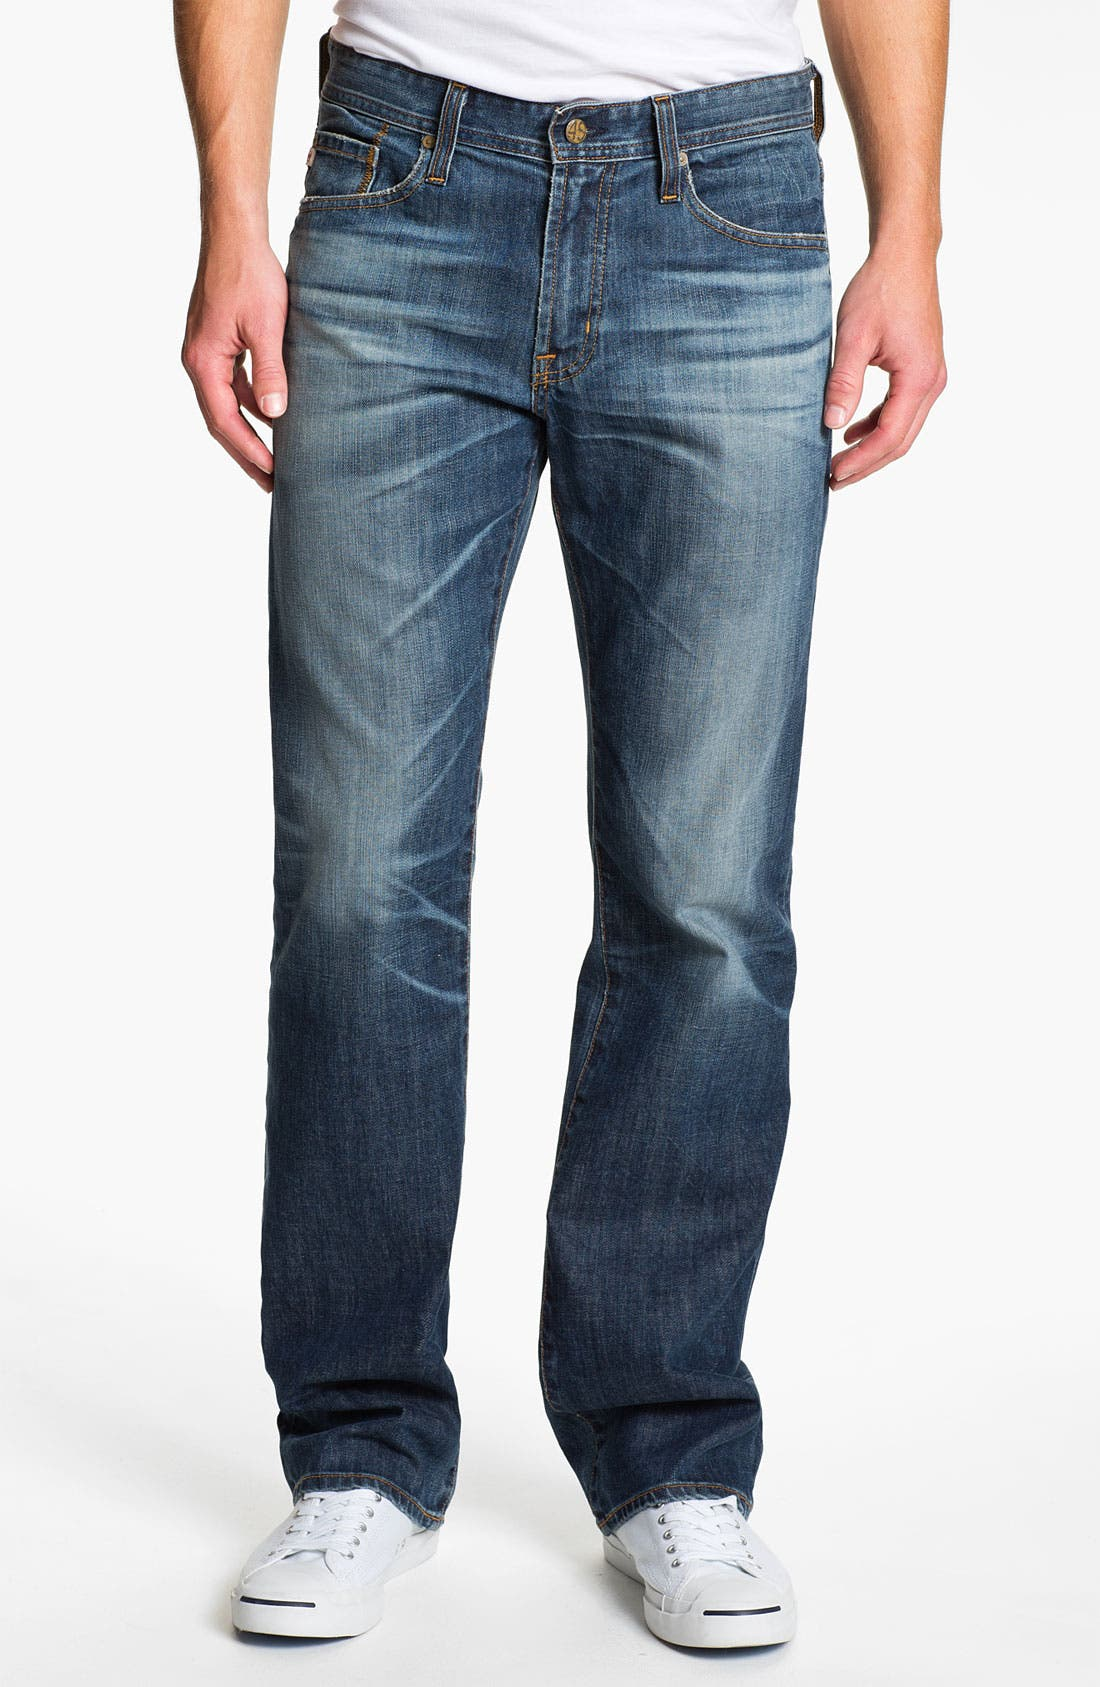 Alternate Image 1 Selected - AG Jeans 'Protégé' Straight Leg Jeans (Eleven Year)